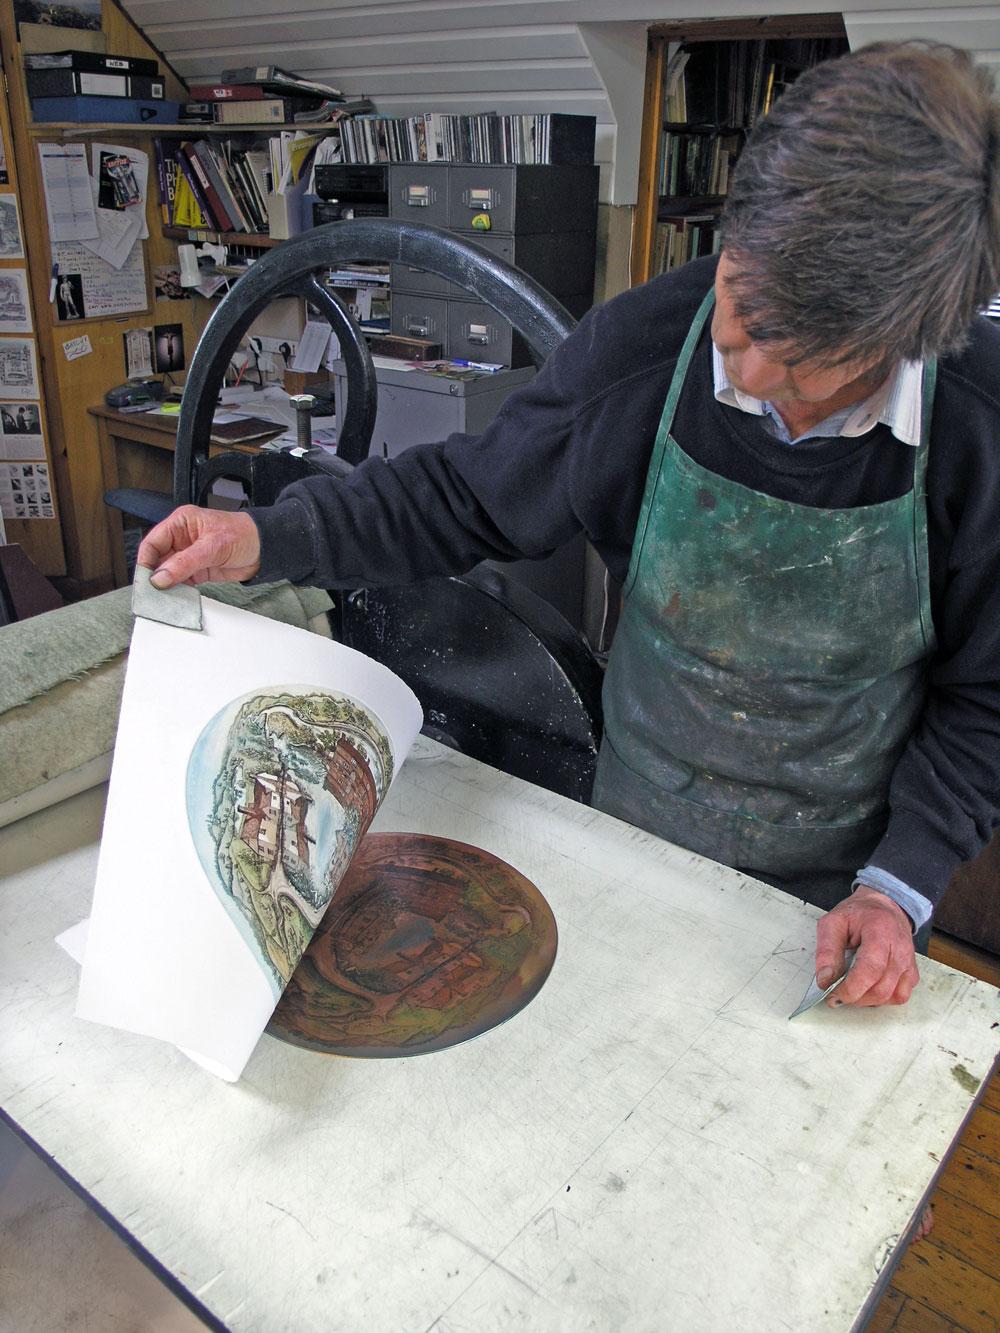 Glynn Thomas  lifting a print from the press